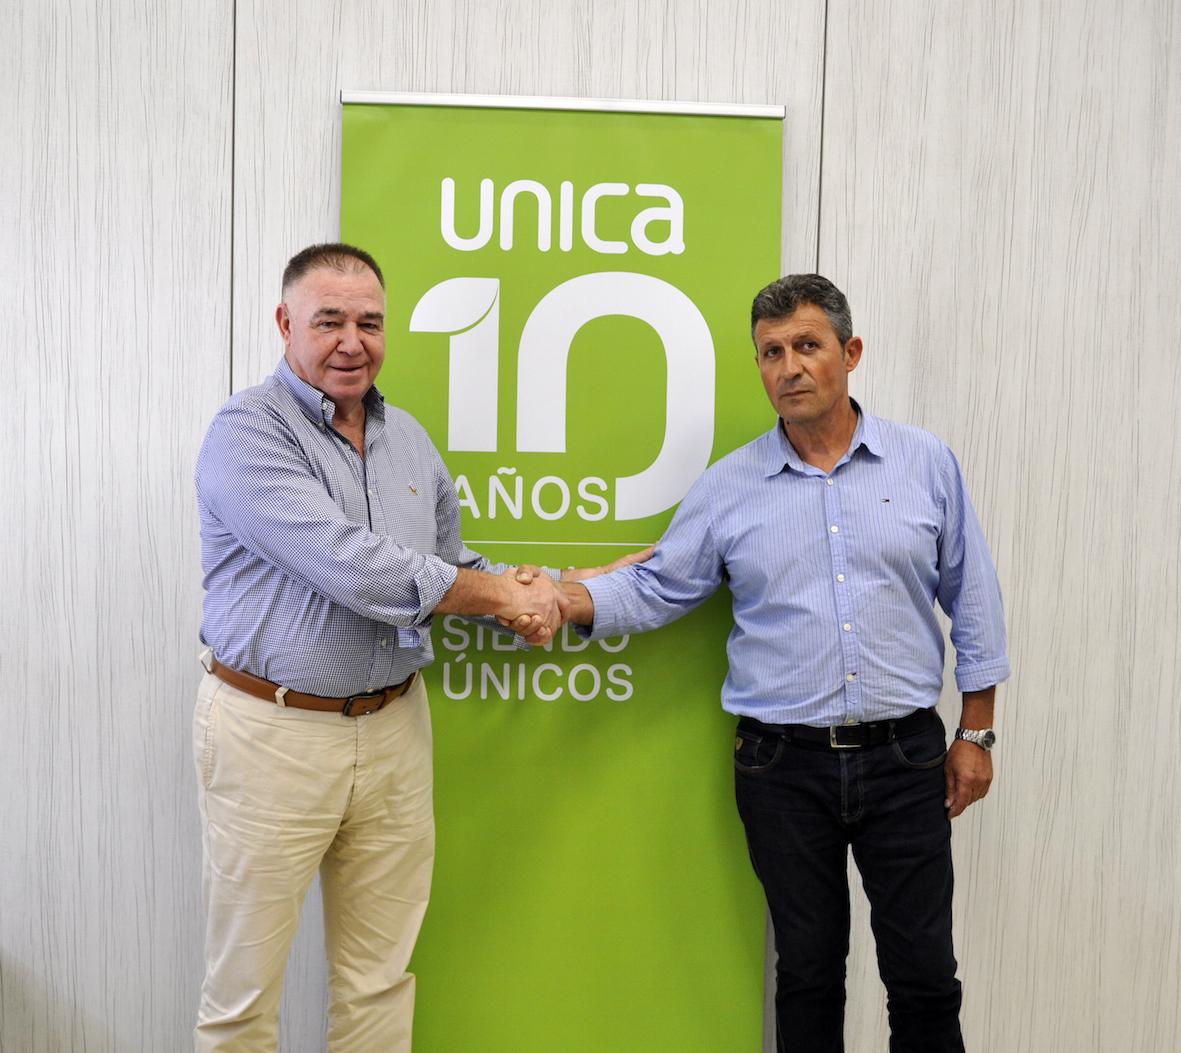 UNICA to reach 500 million kilos in next campaign following incorporation of Copisi